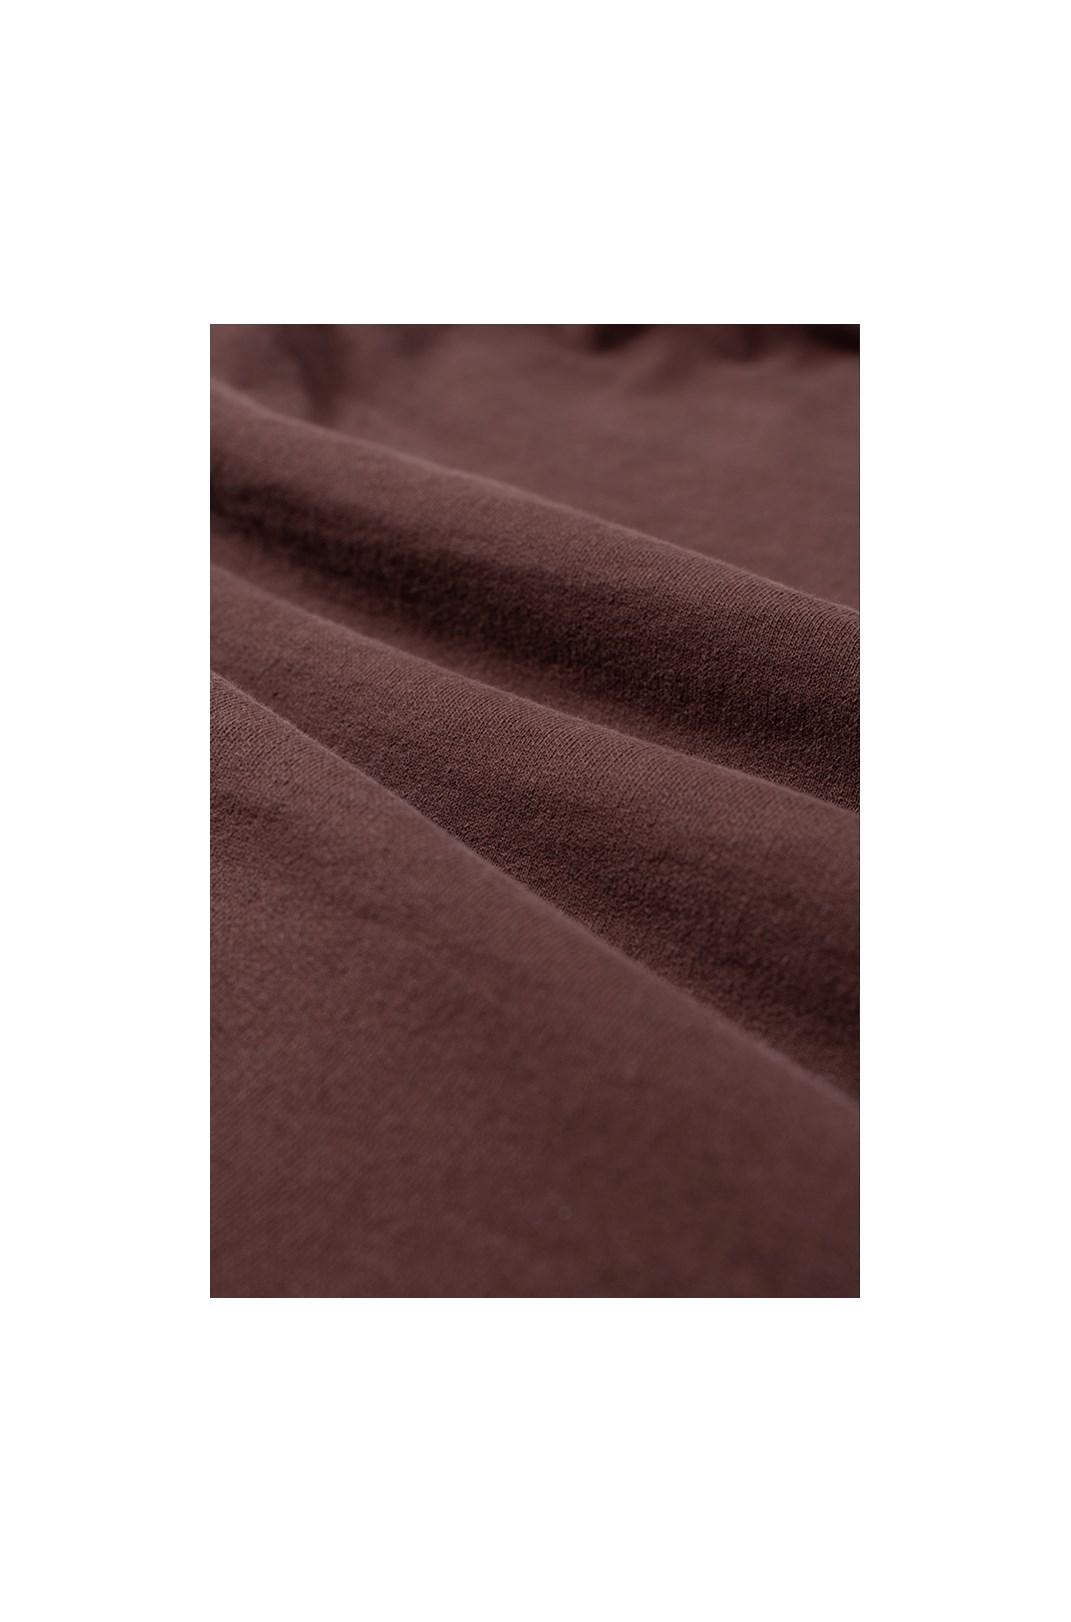 Moletom Cropped Approve Monochromatic Marrom